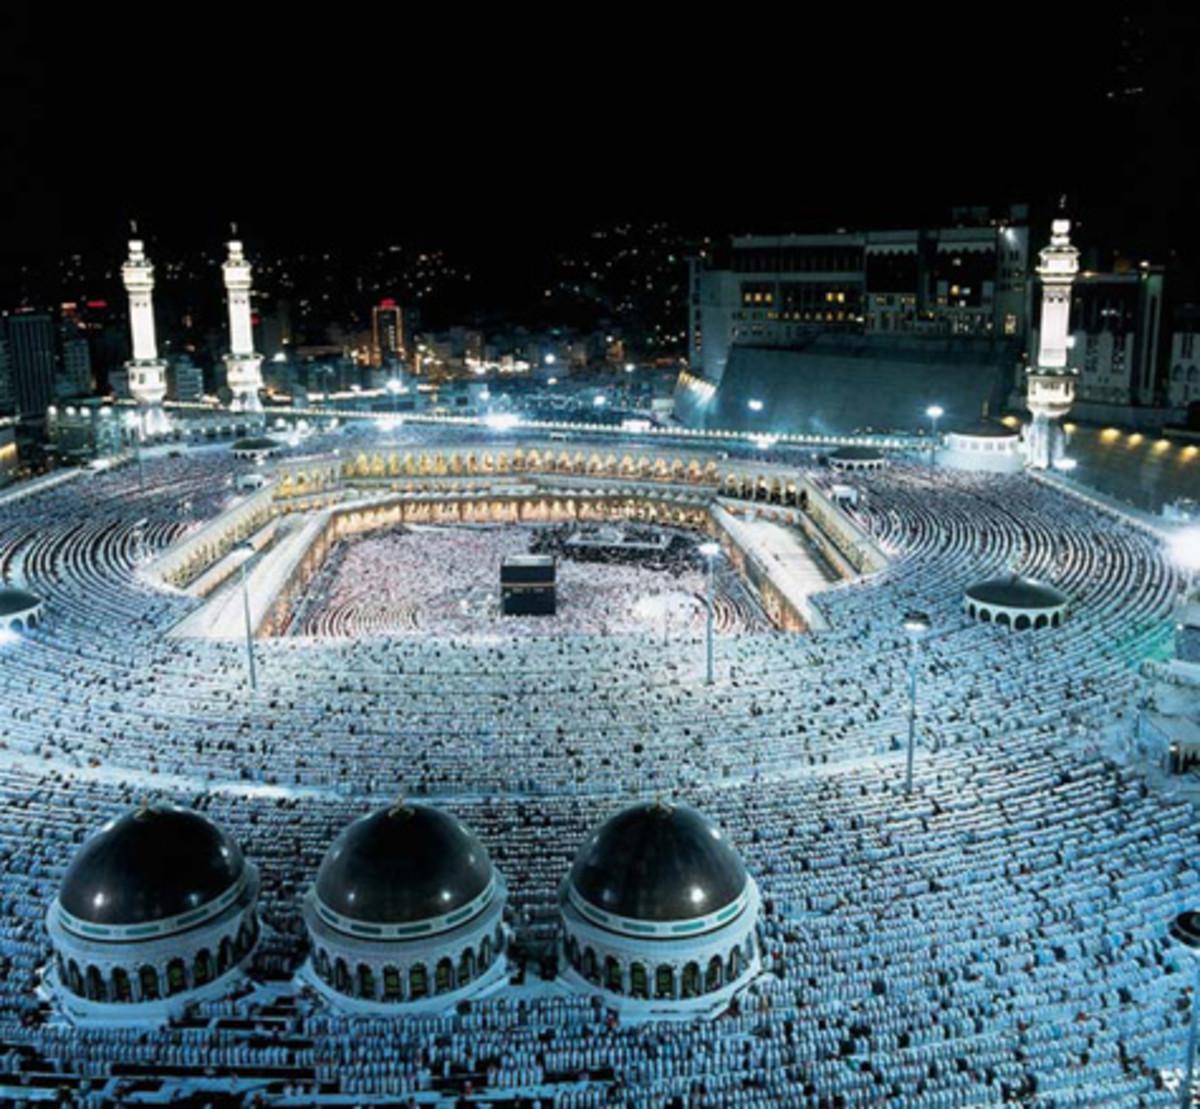 Beautiful image of the Masjid al-Haram in the night